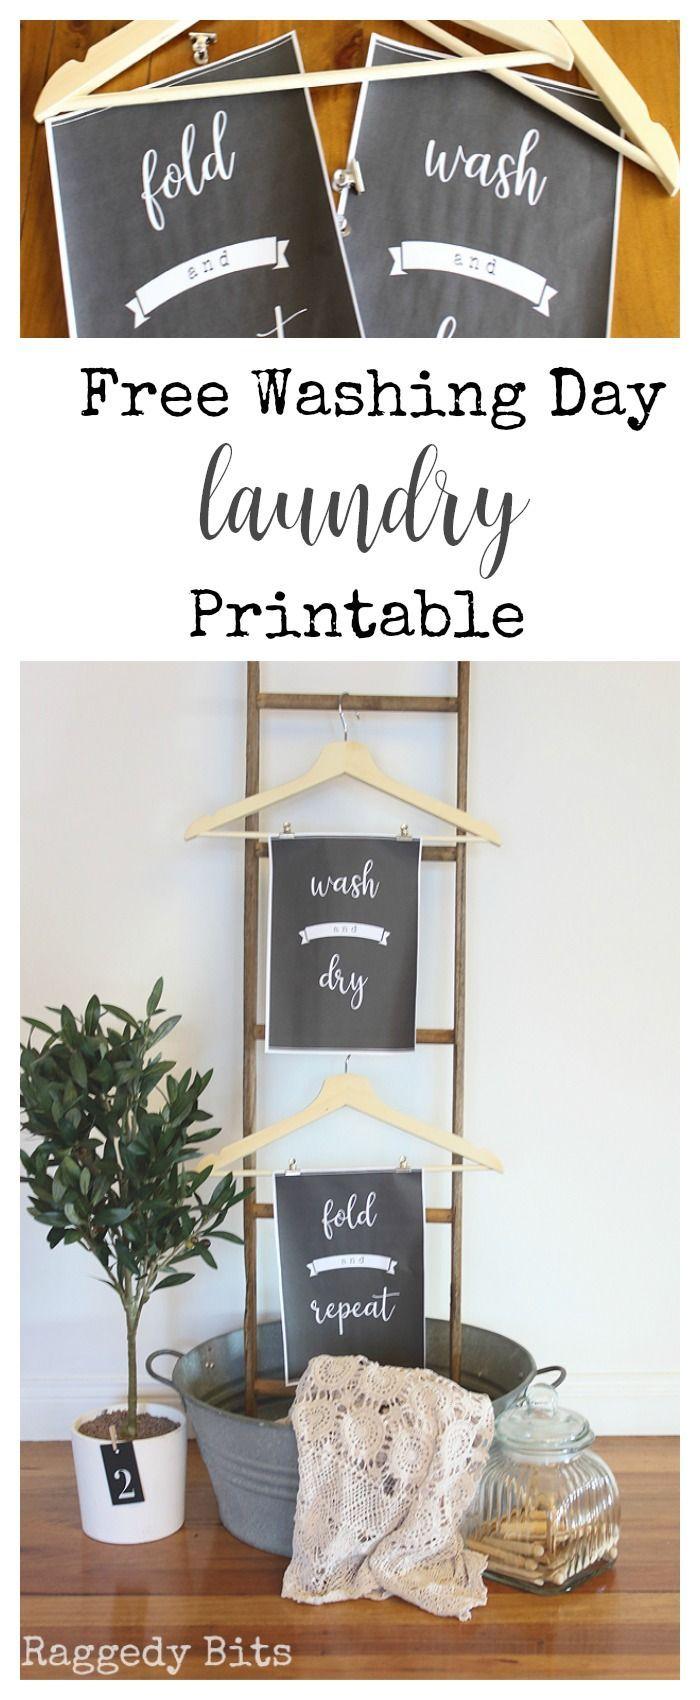 Free Washing Day Laundry Printables Cute Home Decor Decor Diy